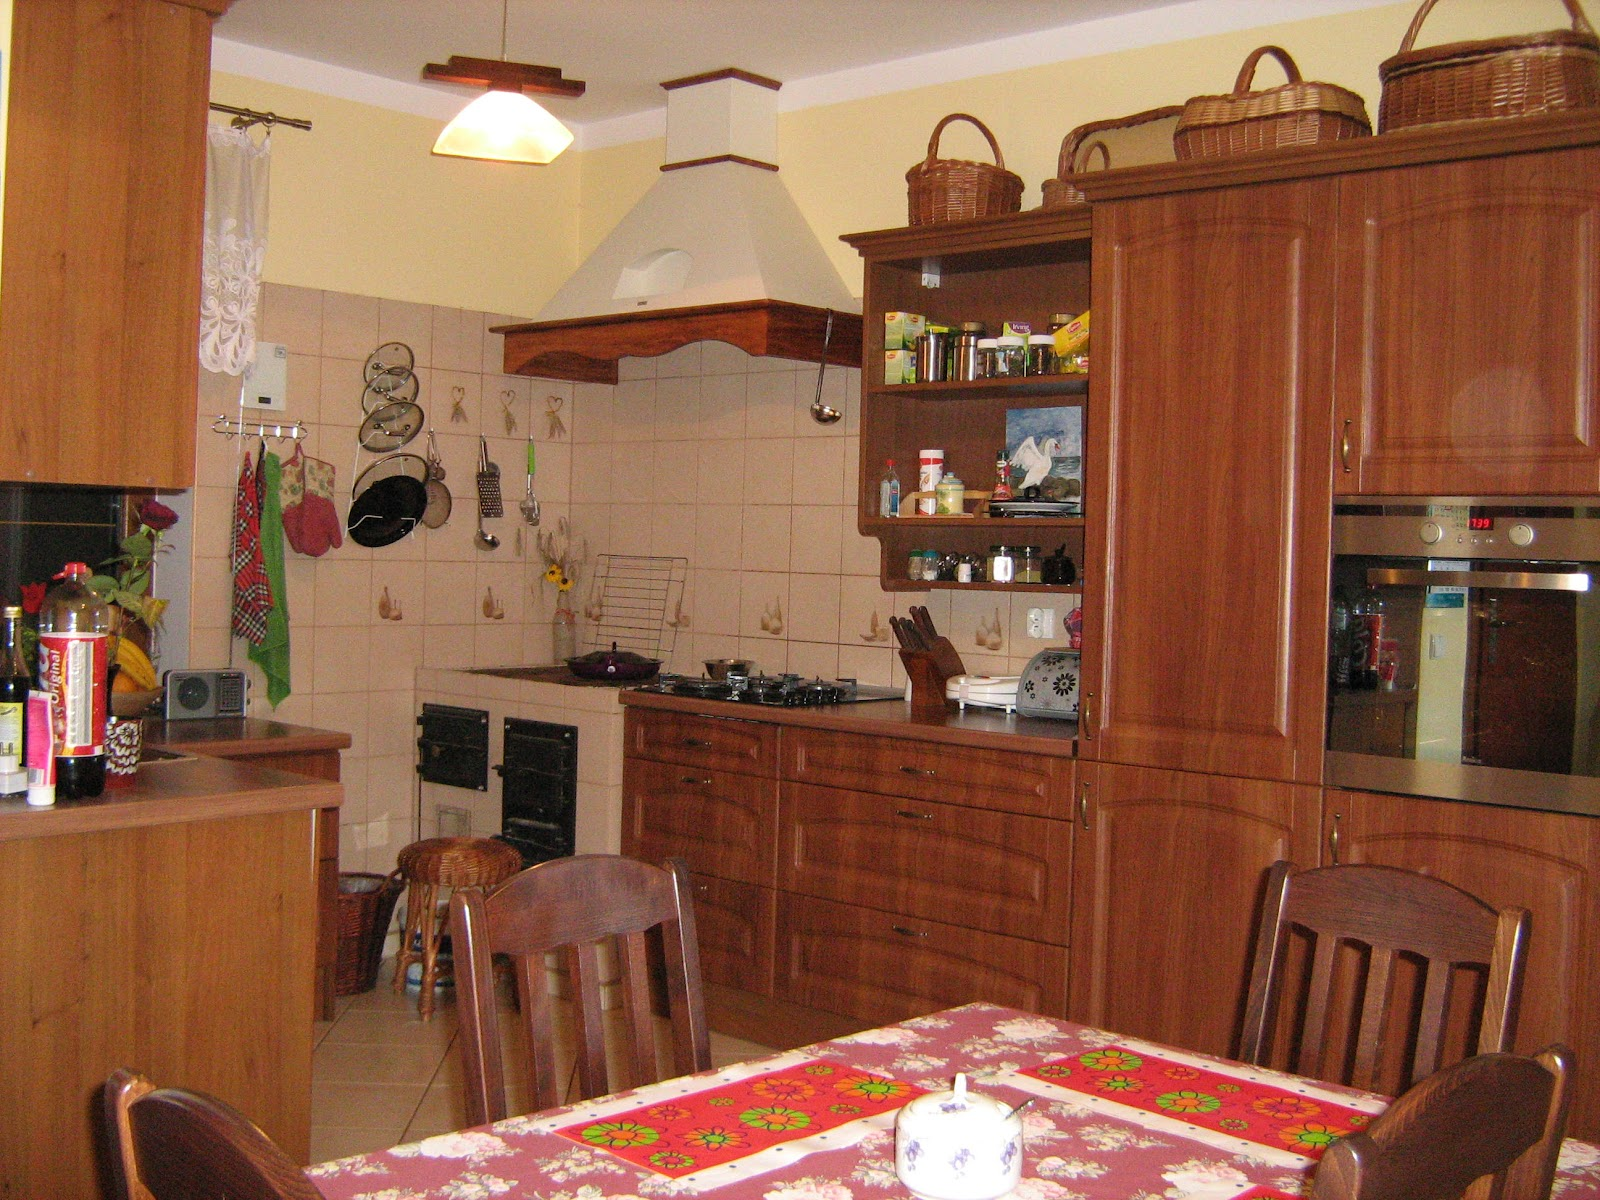 Stare kuchnie